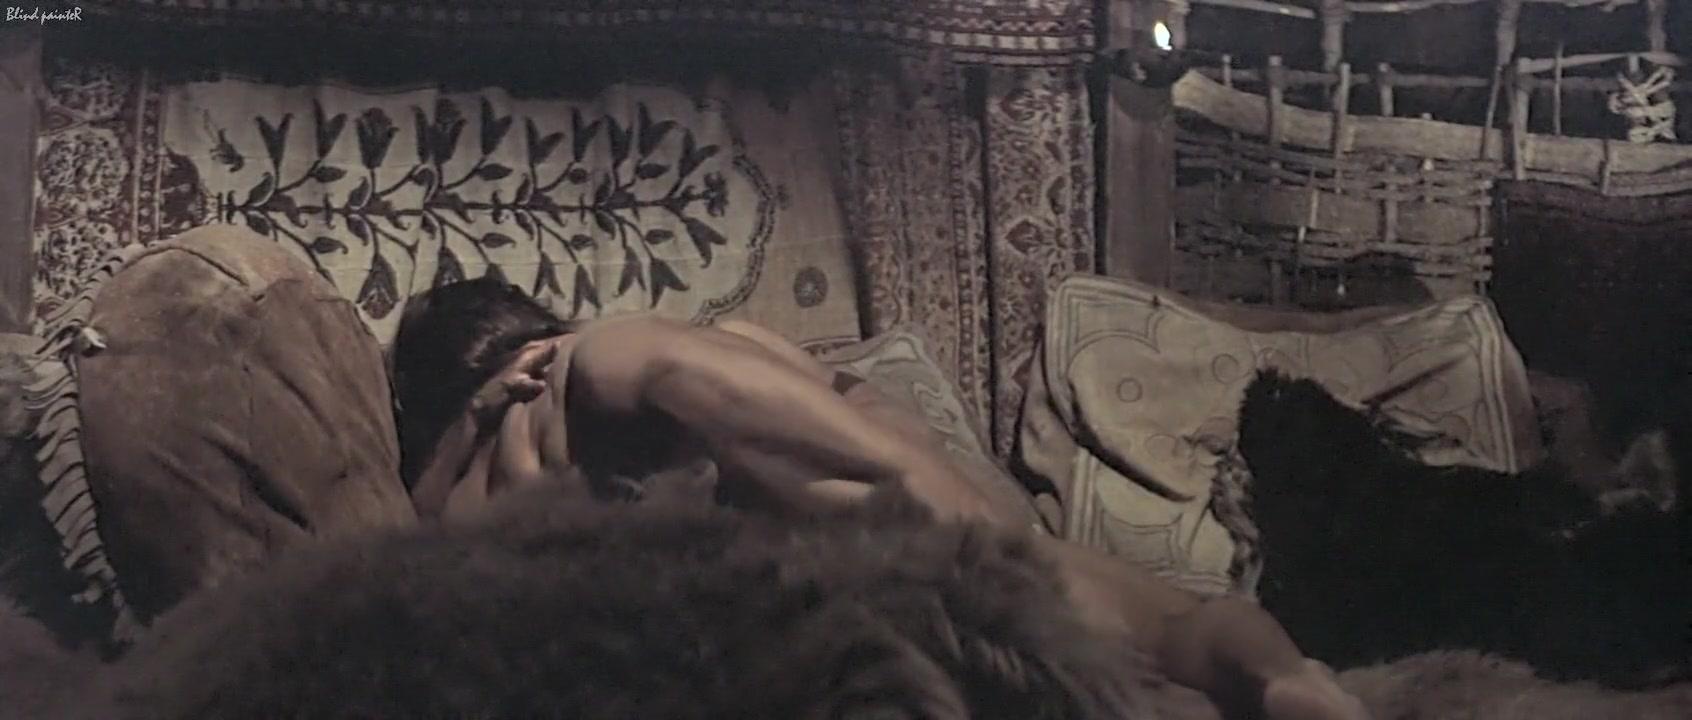 Conan the barbarian sex scenes porno videos